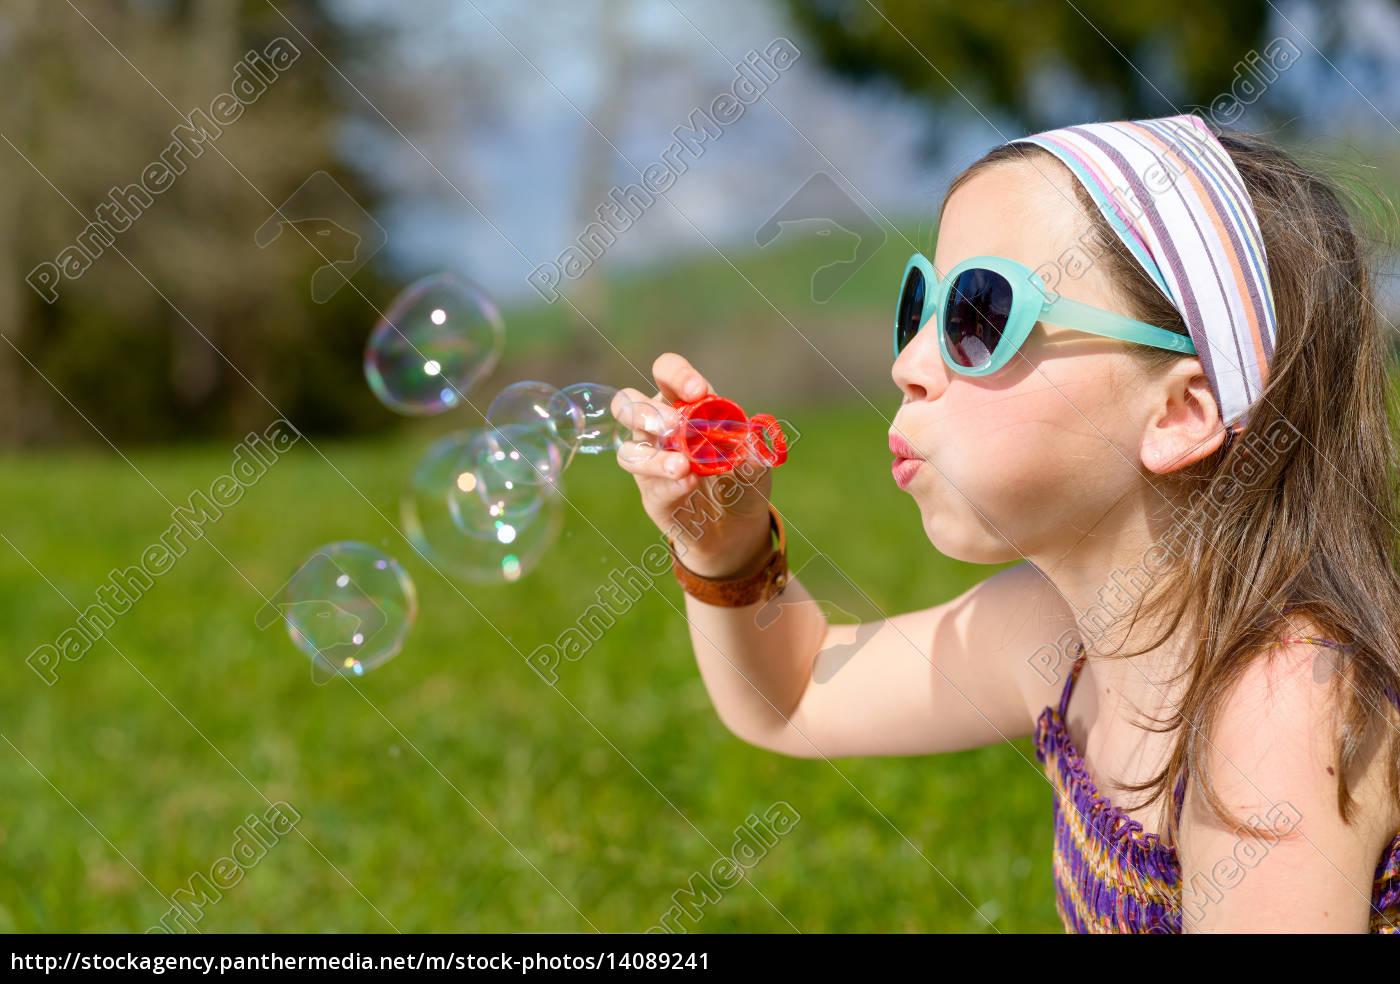 a, little, girl, making, soap, bubbles - 14089241